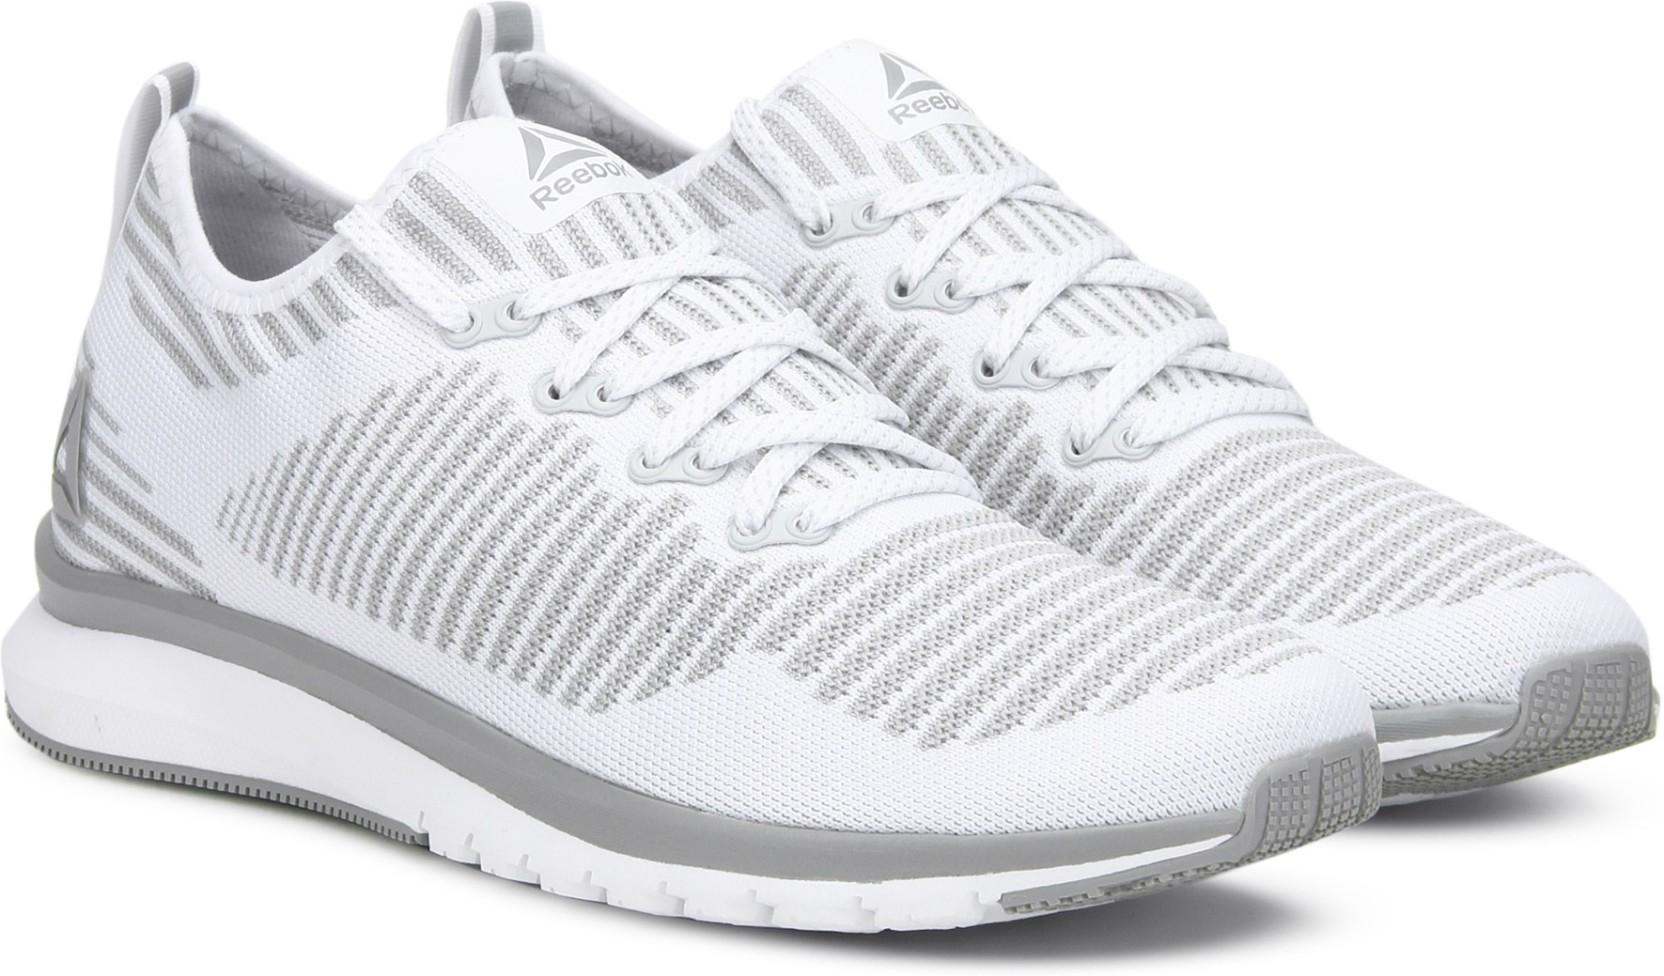 Print 0 Shoes For Smooth 2 Men Reebok Running Ultk QhtdsrC